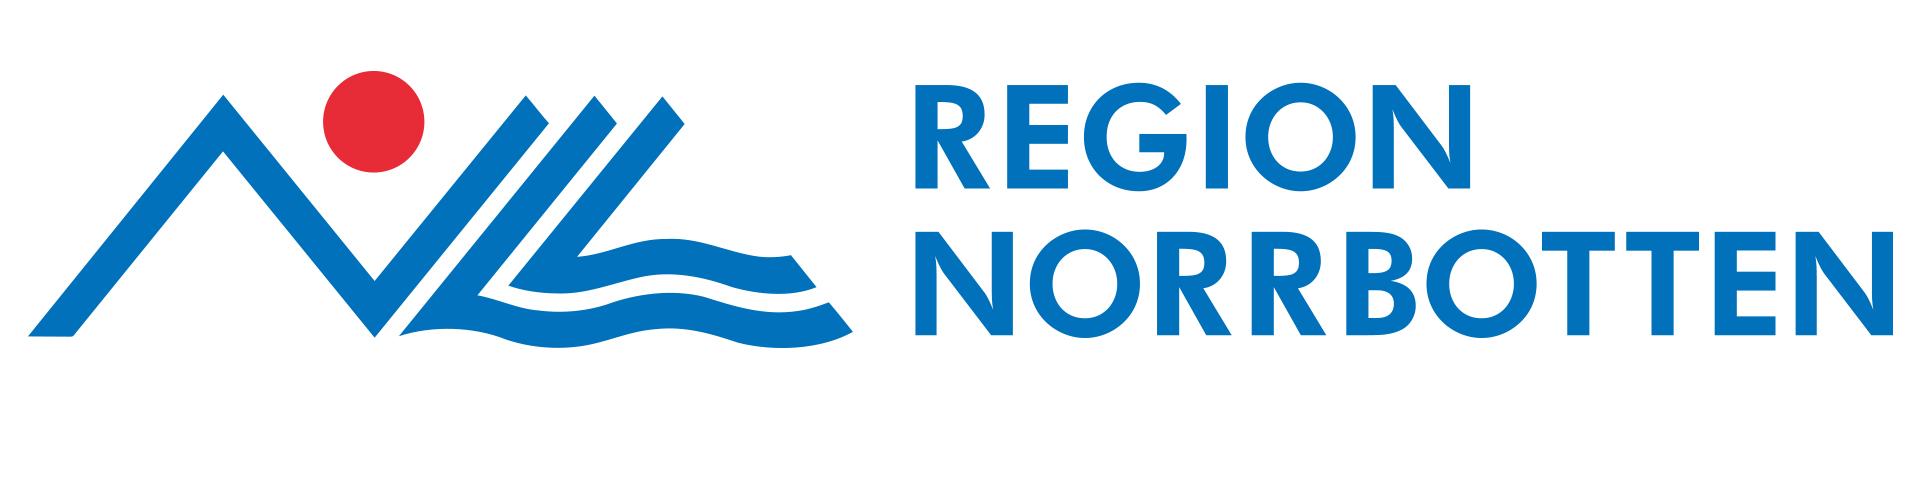 Region_Norrbotten_logga_1920x1080.jpg